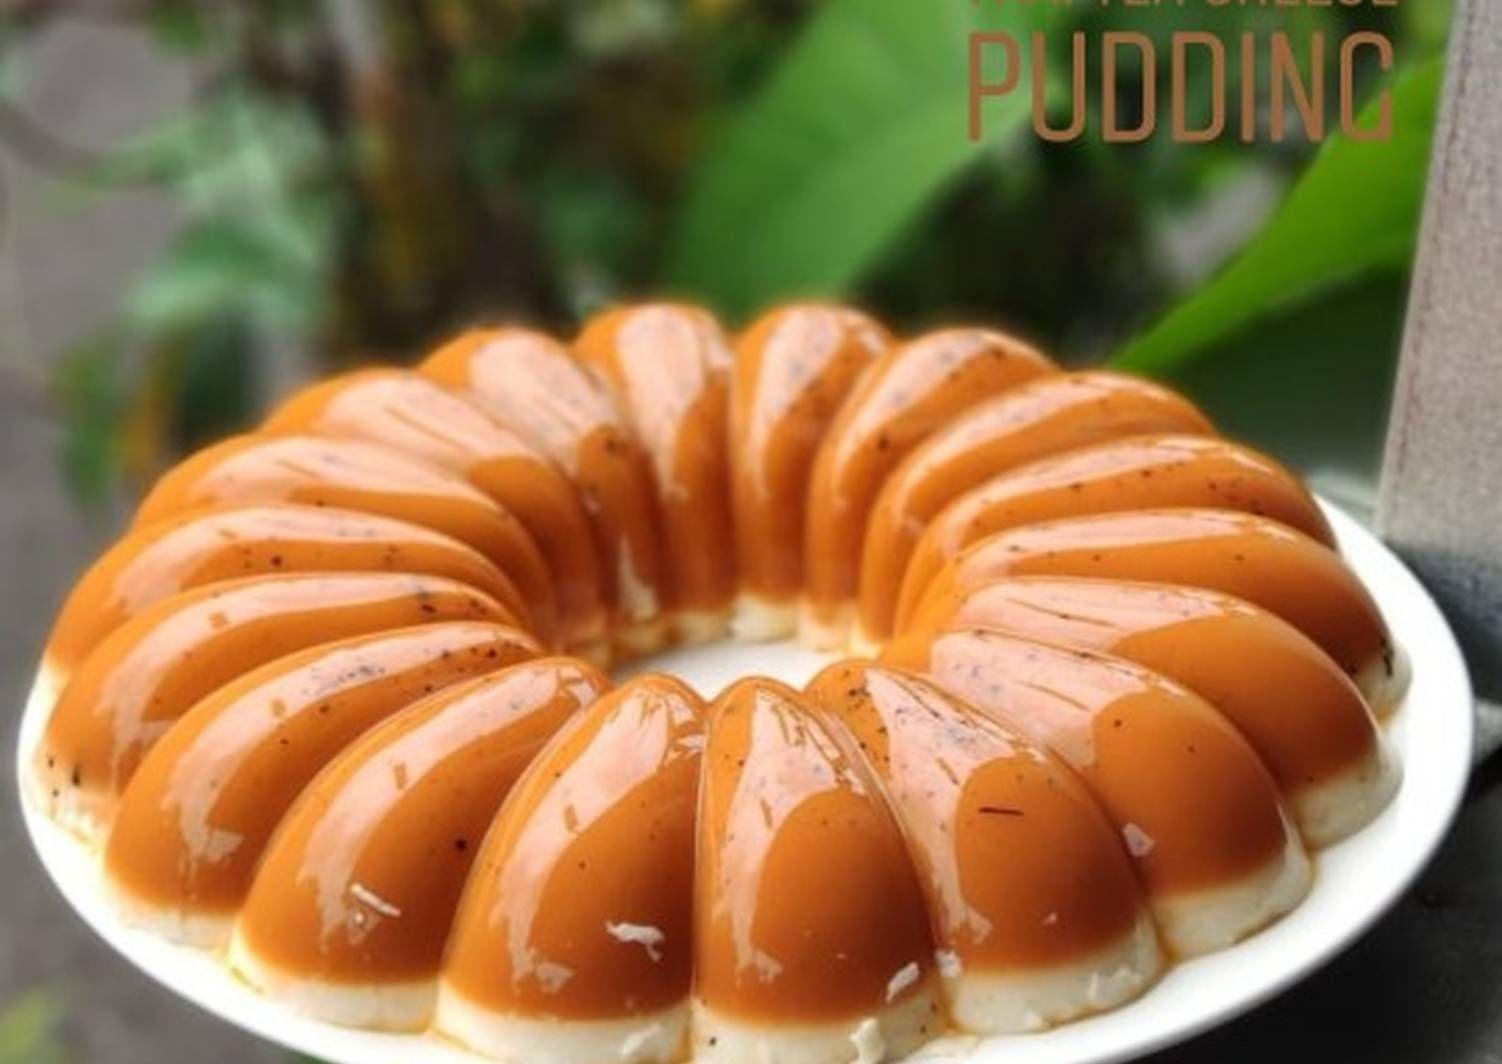 Resep Thai Tea Cheese Pudding Oleh Novi Phiew Resep Puding Keju Puding Resep